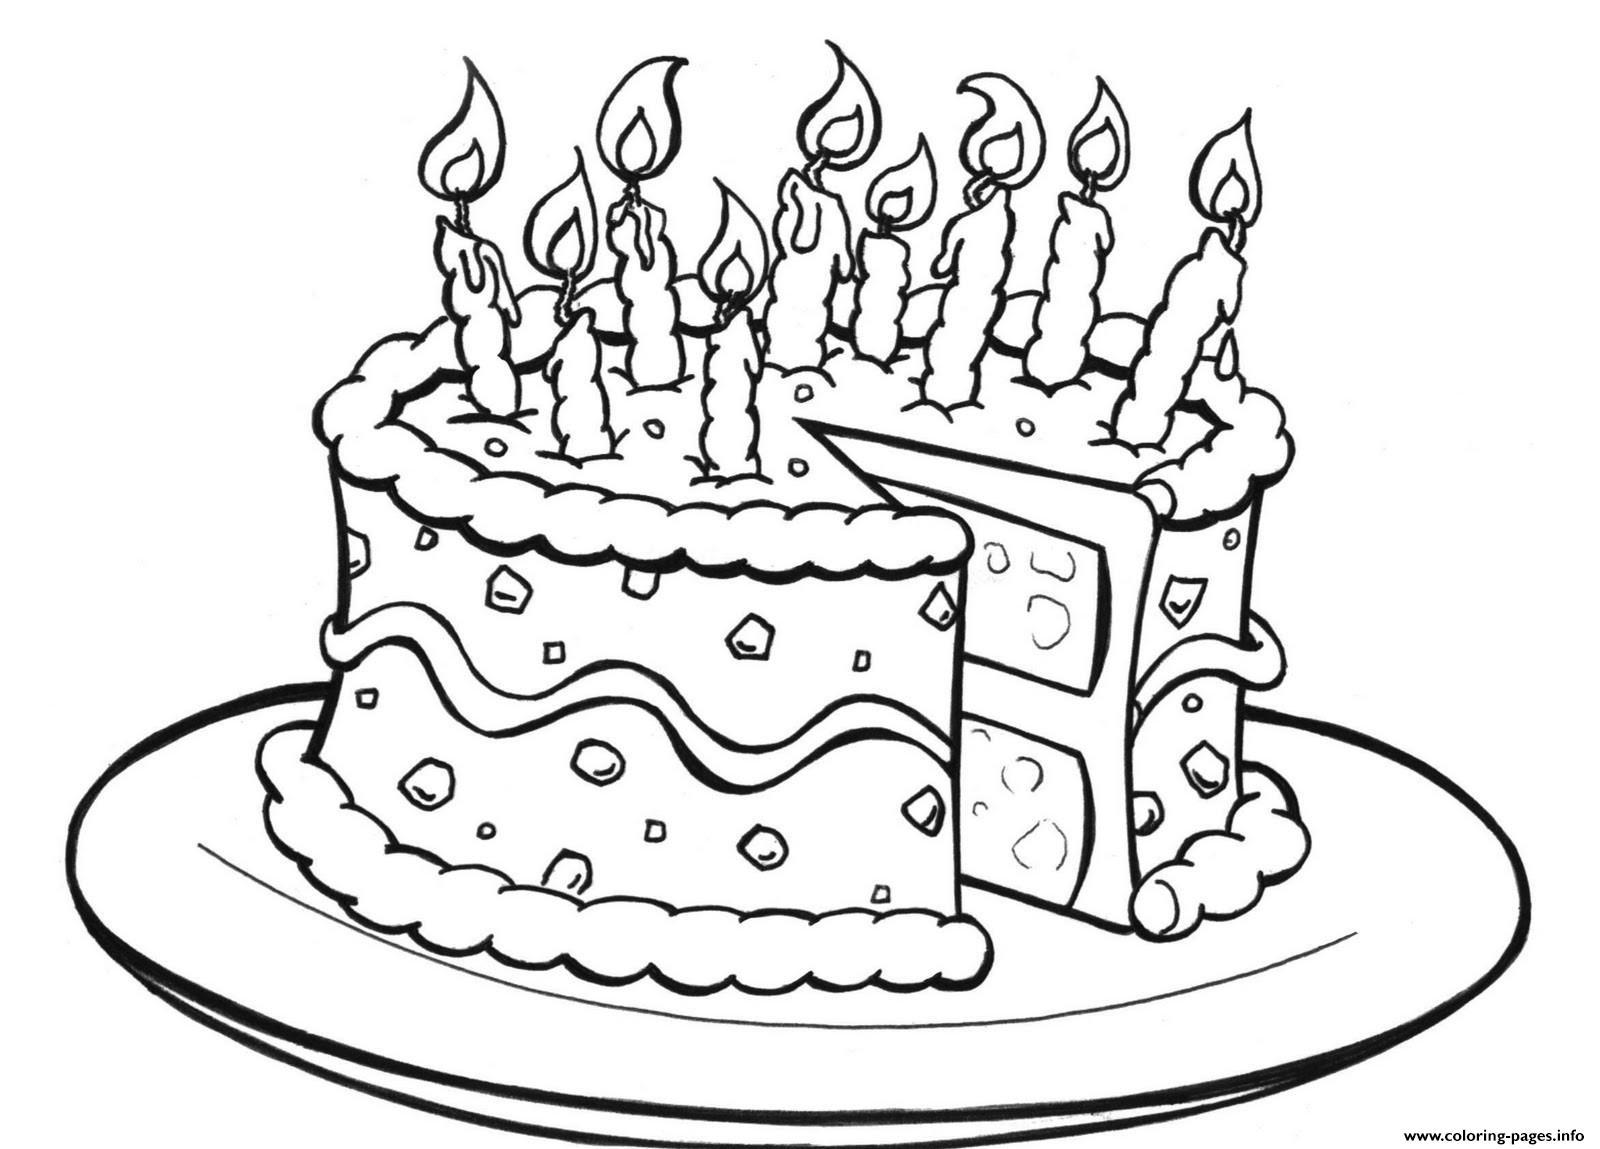 Birthday Cake Printablee049 Coloring Pages Printable